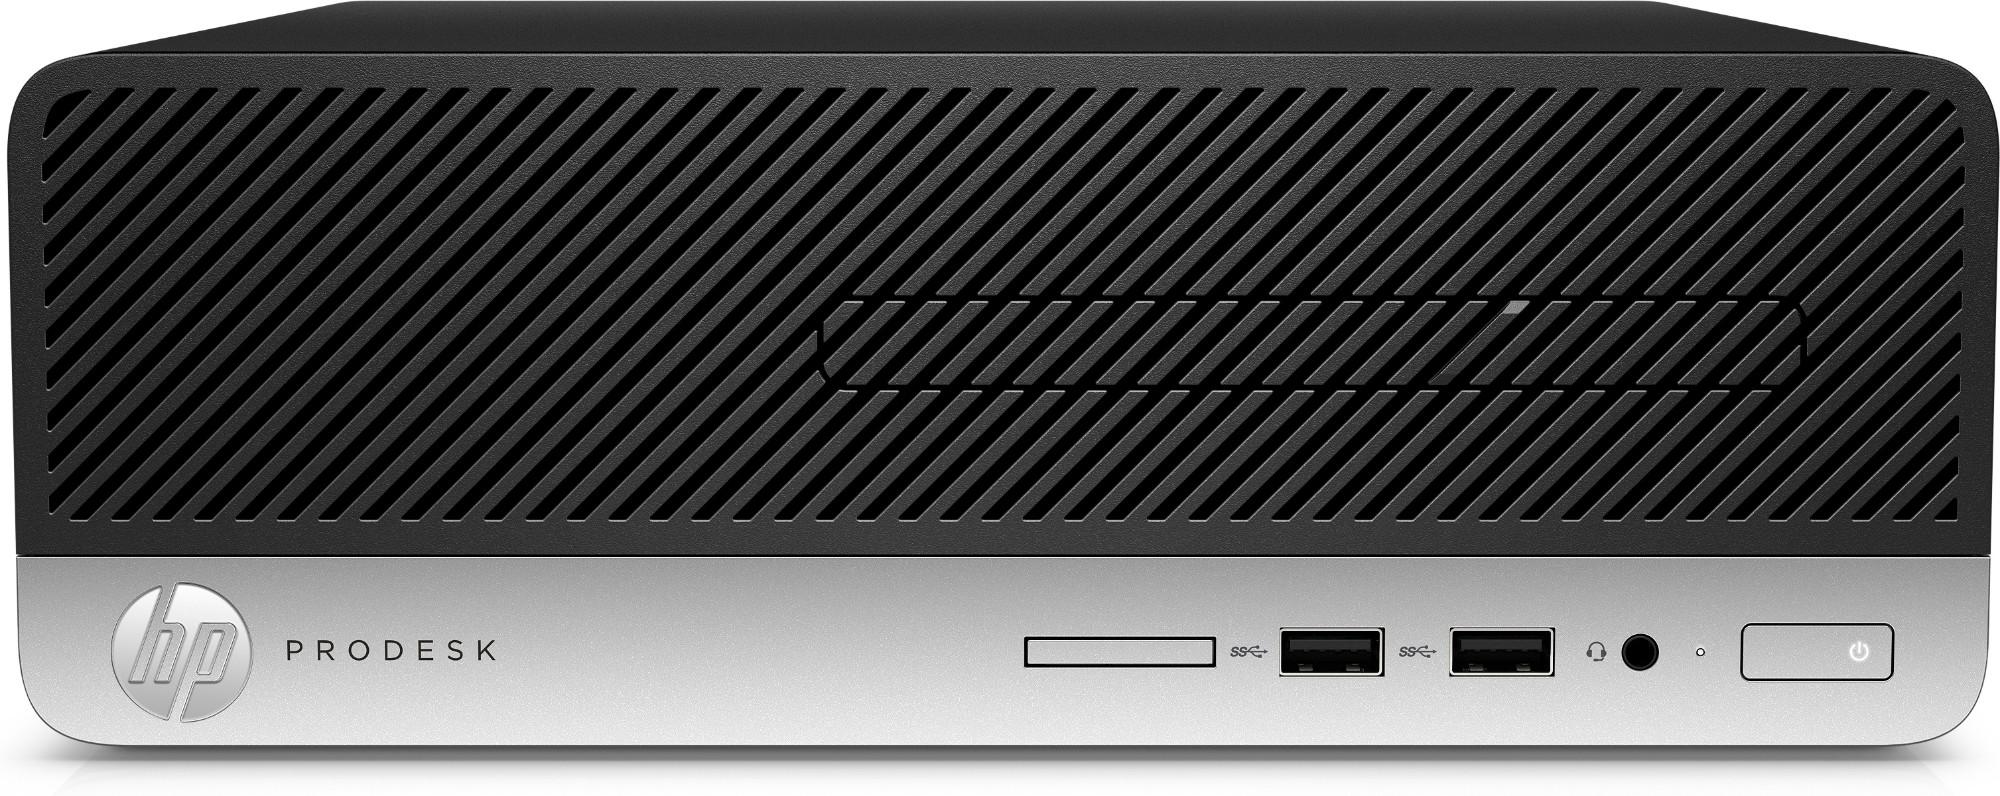 HP ProDesk 400 G6 8ª generación de procesadores Intel® Core™ i7 i7-8700 8 GB DDR4-SDRAM 256 GB SSD SFF Negro PC Windows 10 Pro